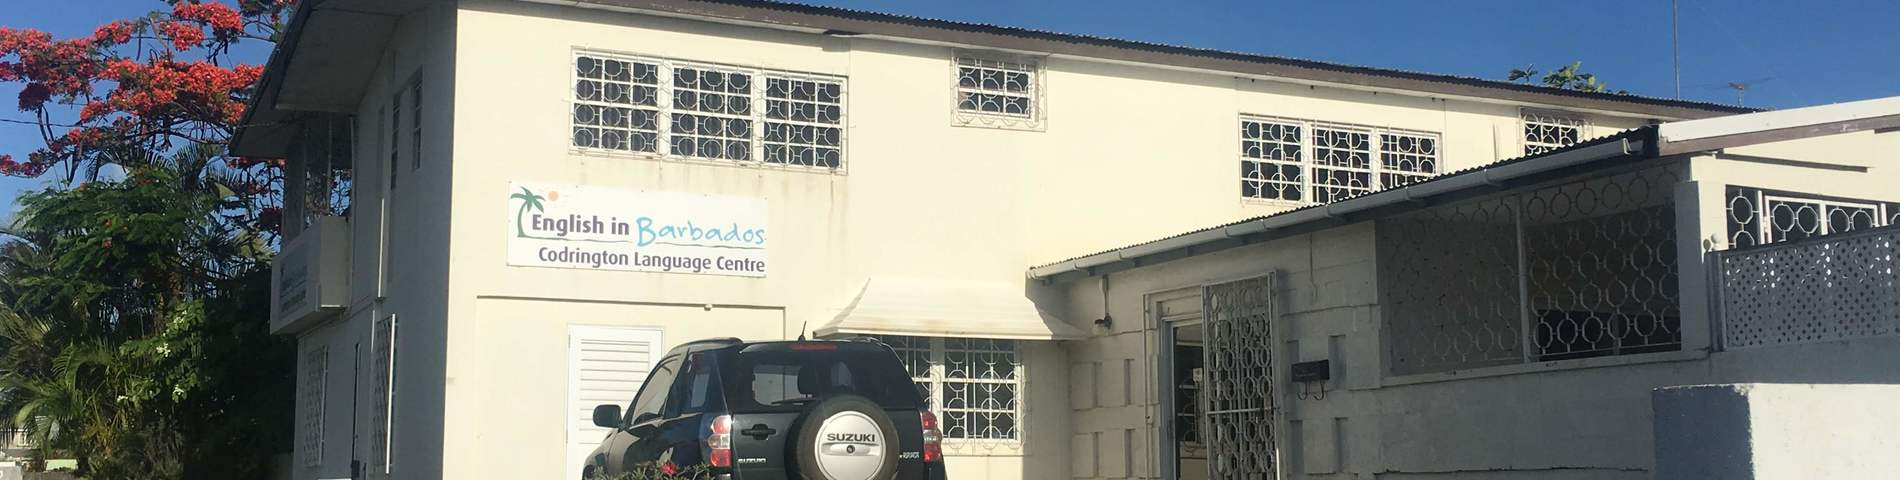 Imagen 1 de la escuela The Codrington Language Centre